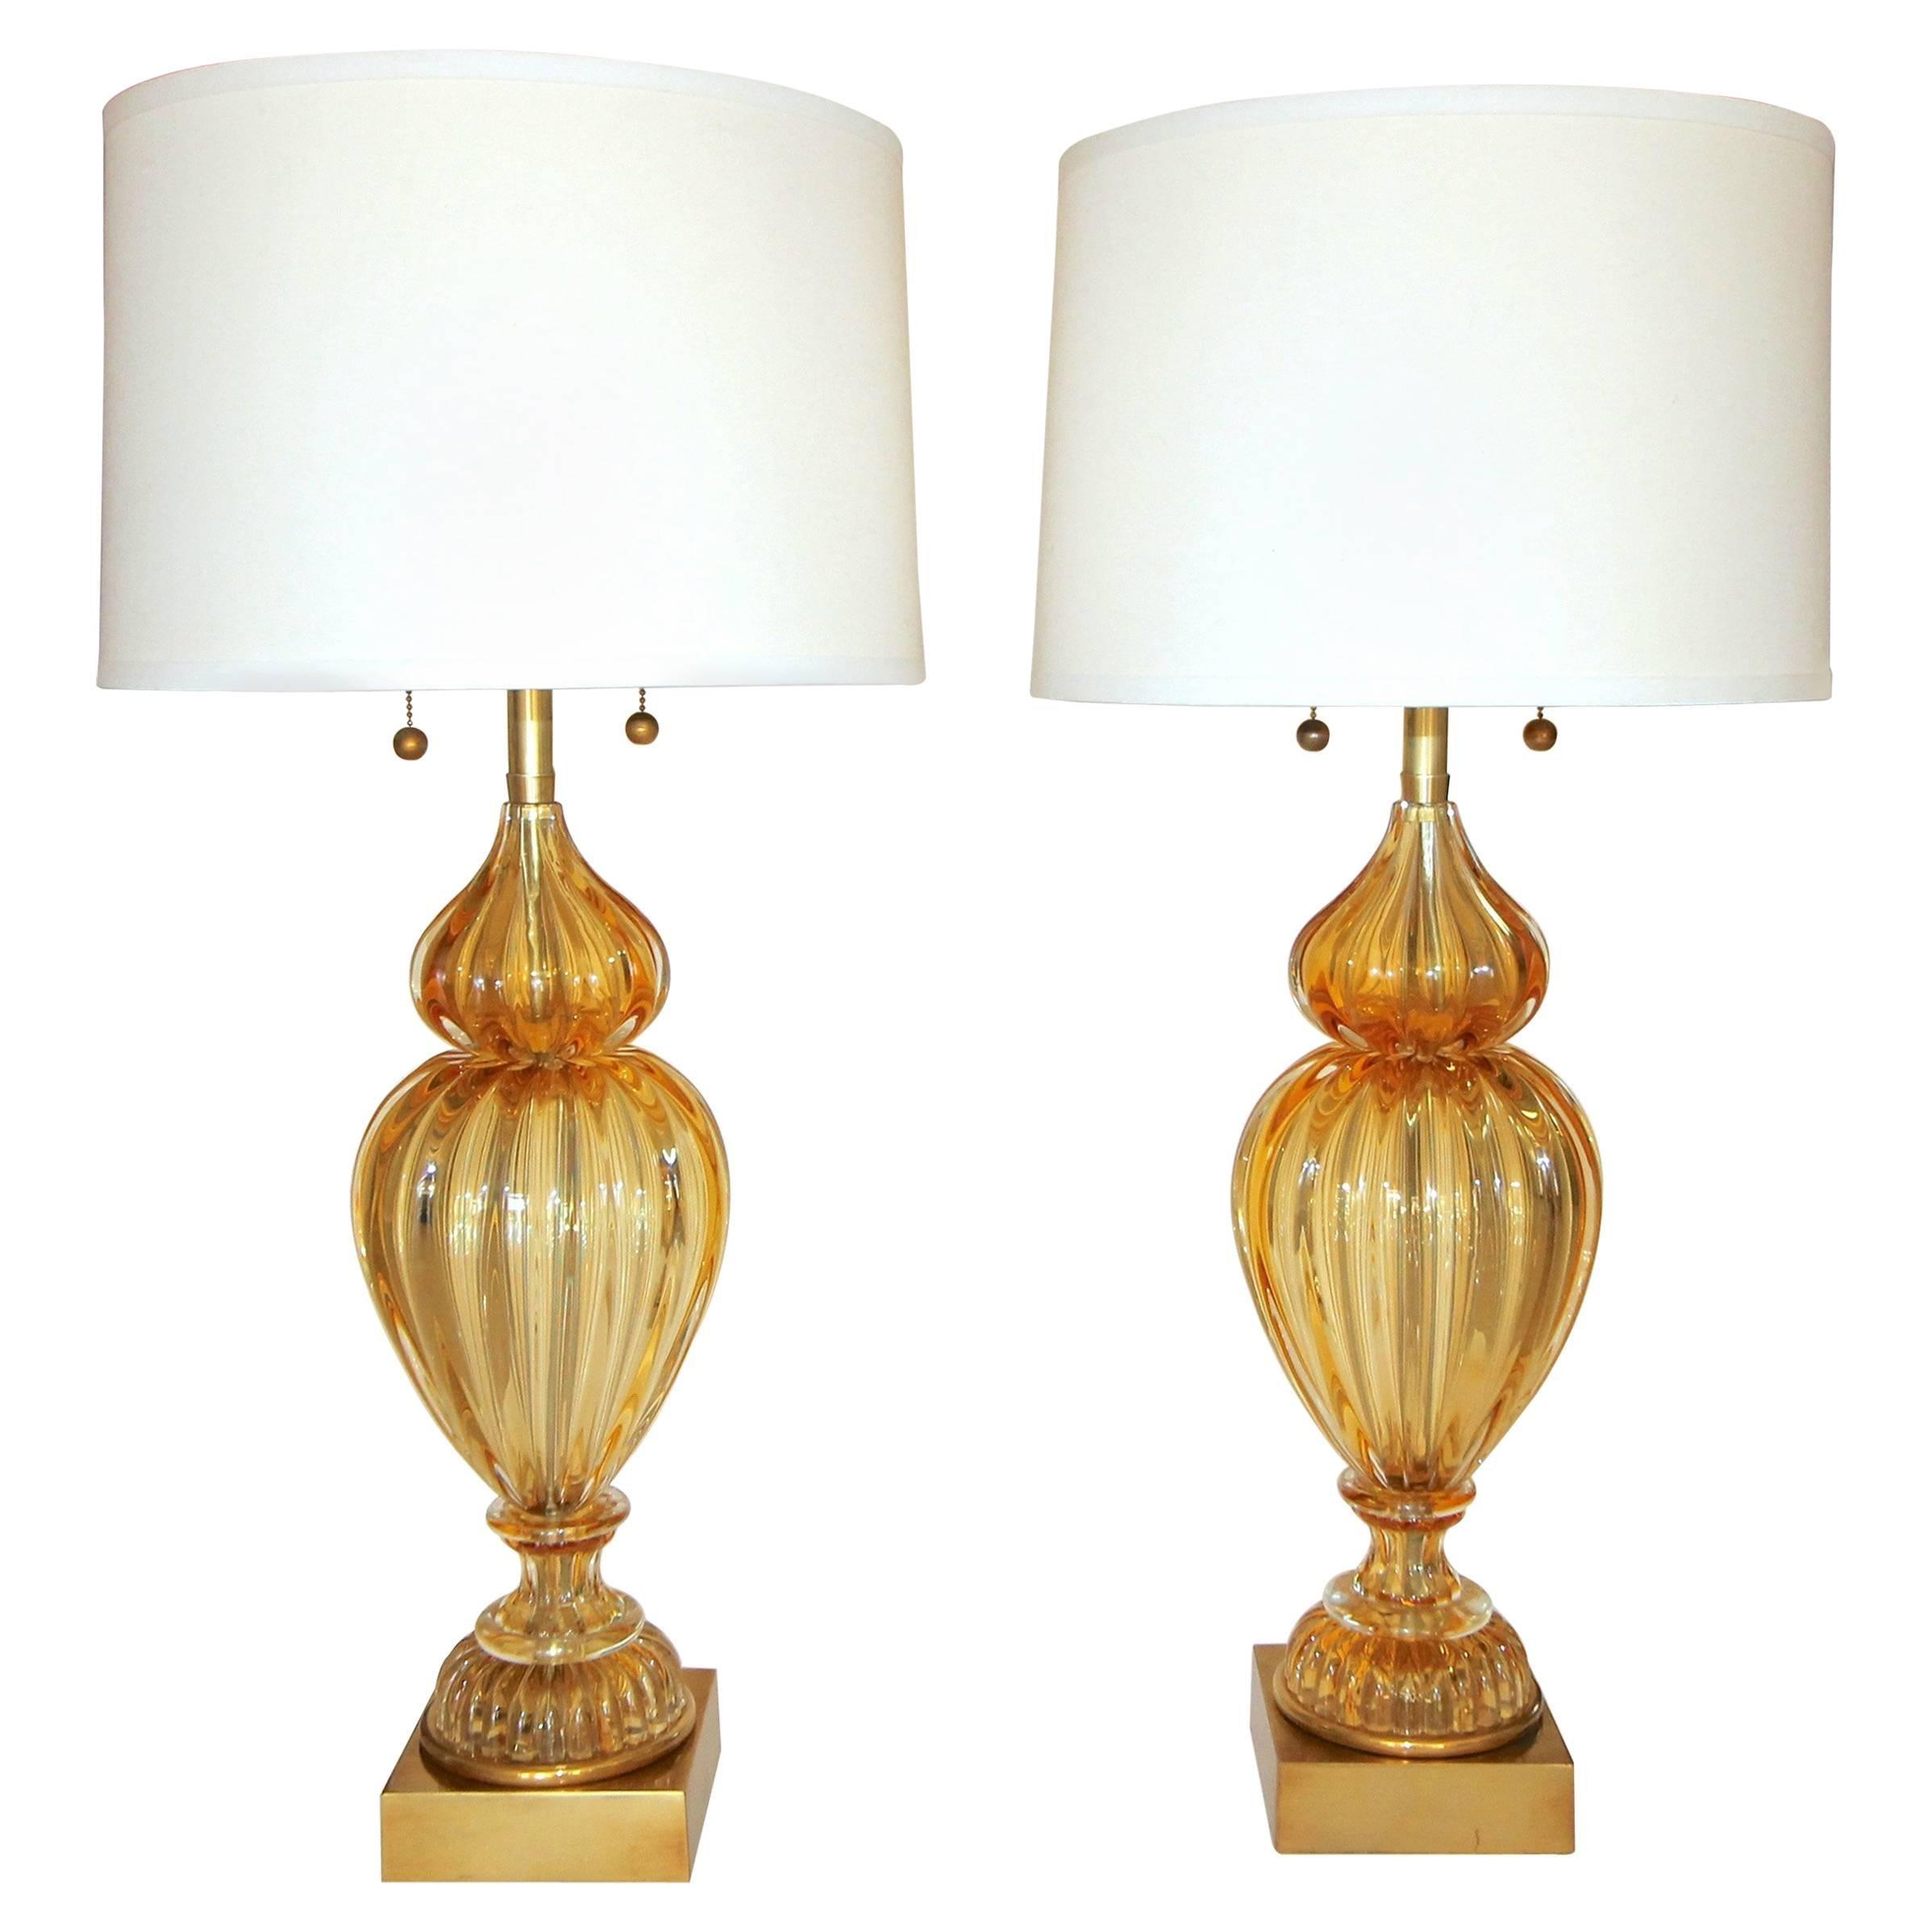 Pair Of Large Marbro Seguso Murano Golden Amber Table Lamps